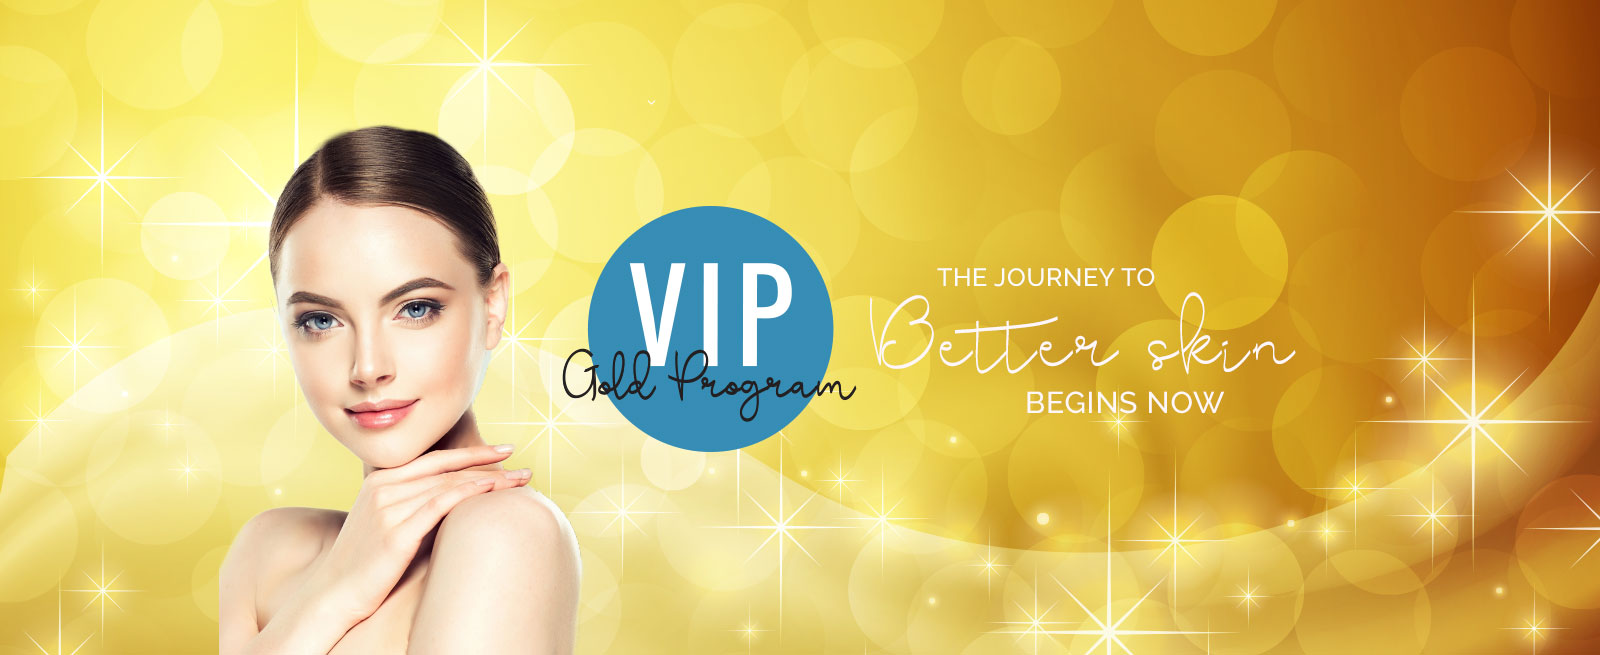 VIP Gold Program